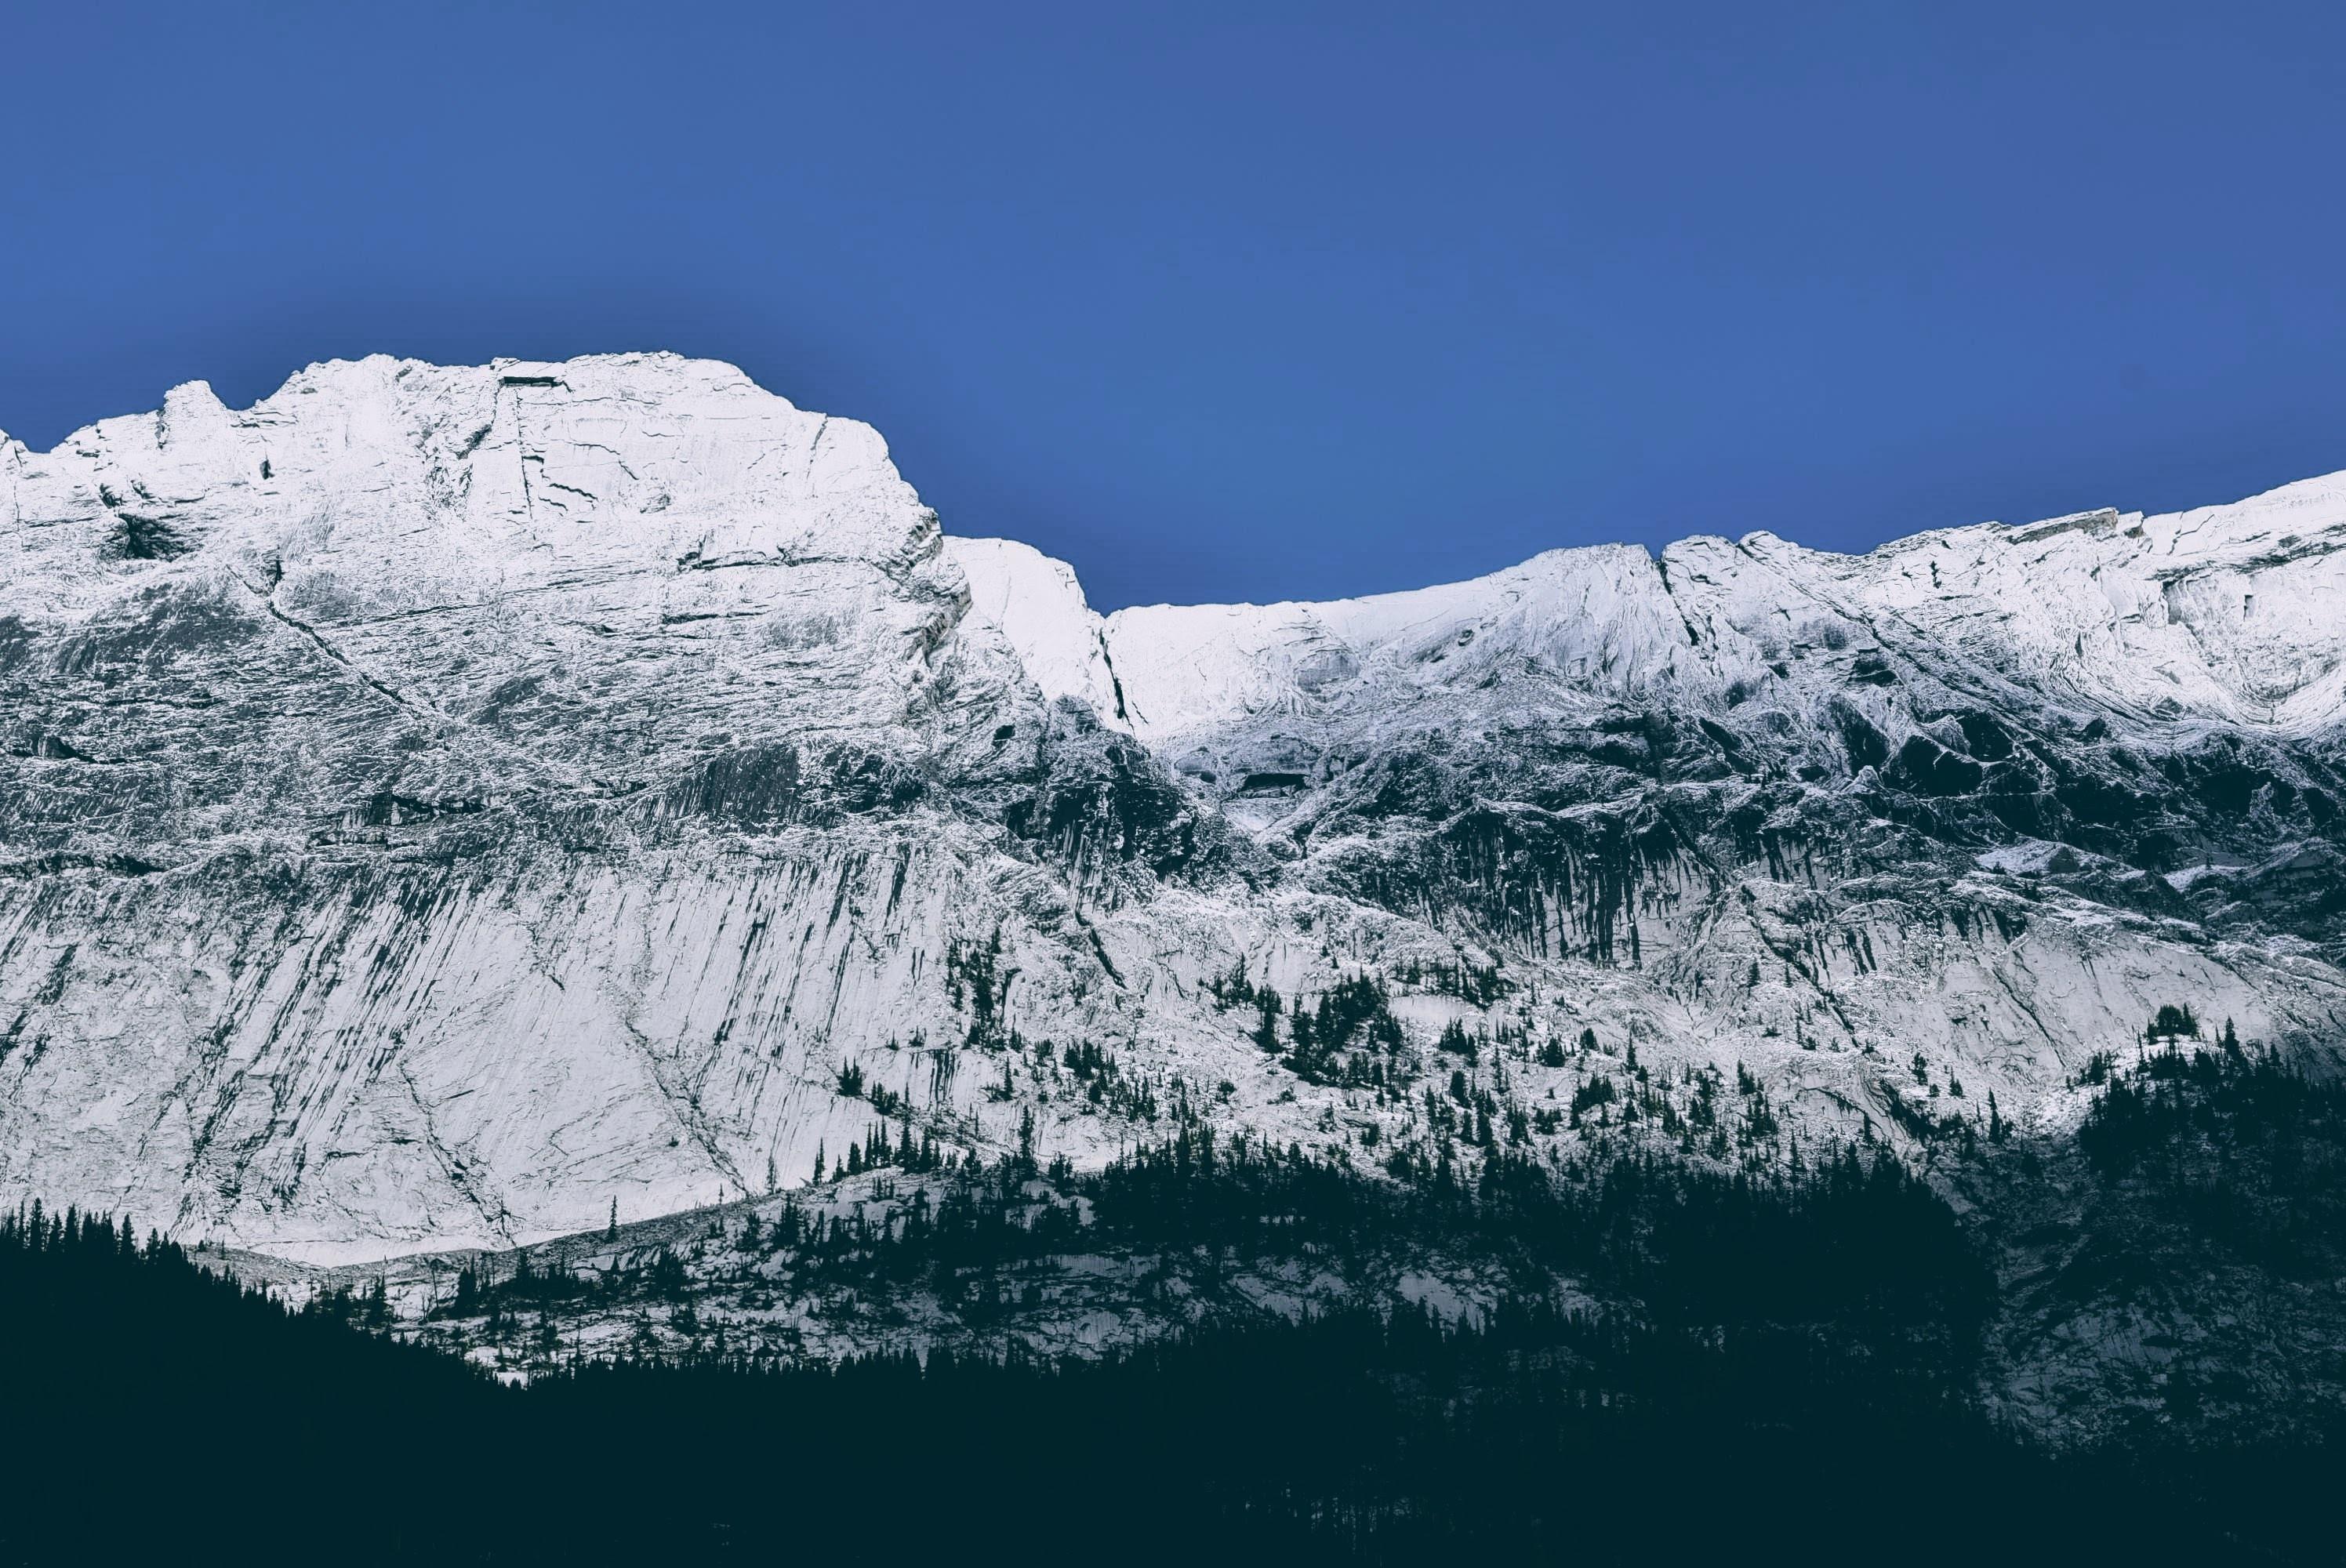 A tall steep mountain face against a blue sky in Jasper National Park